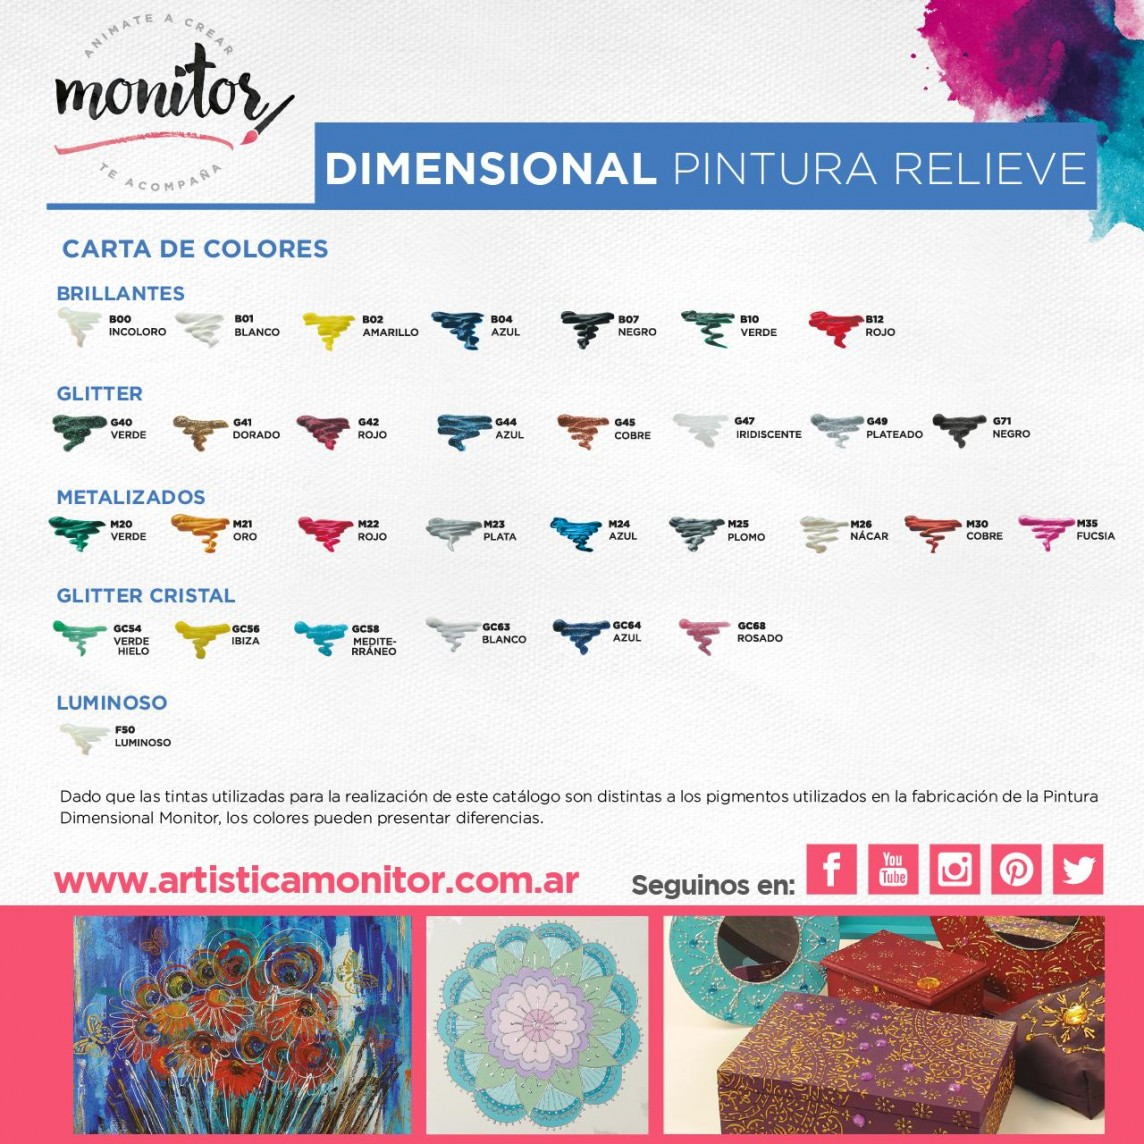 Carta de colores para Pintura Dimensional